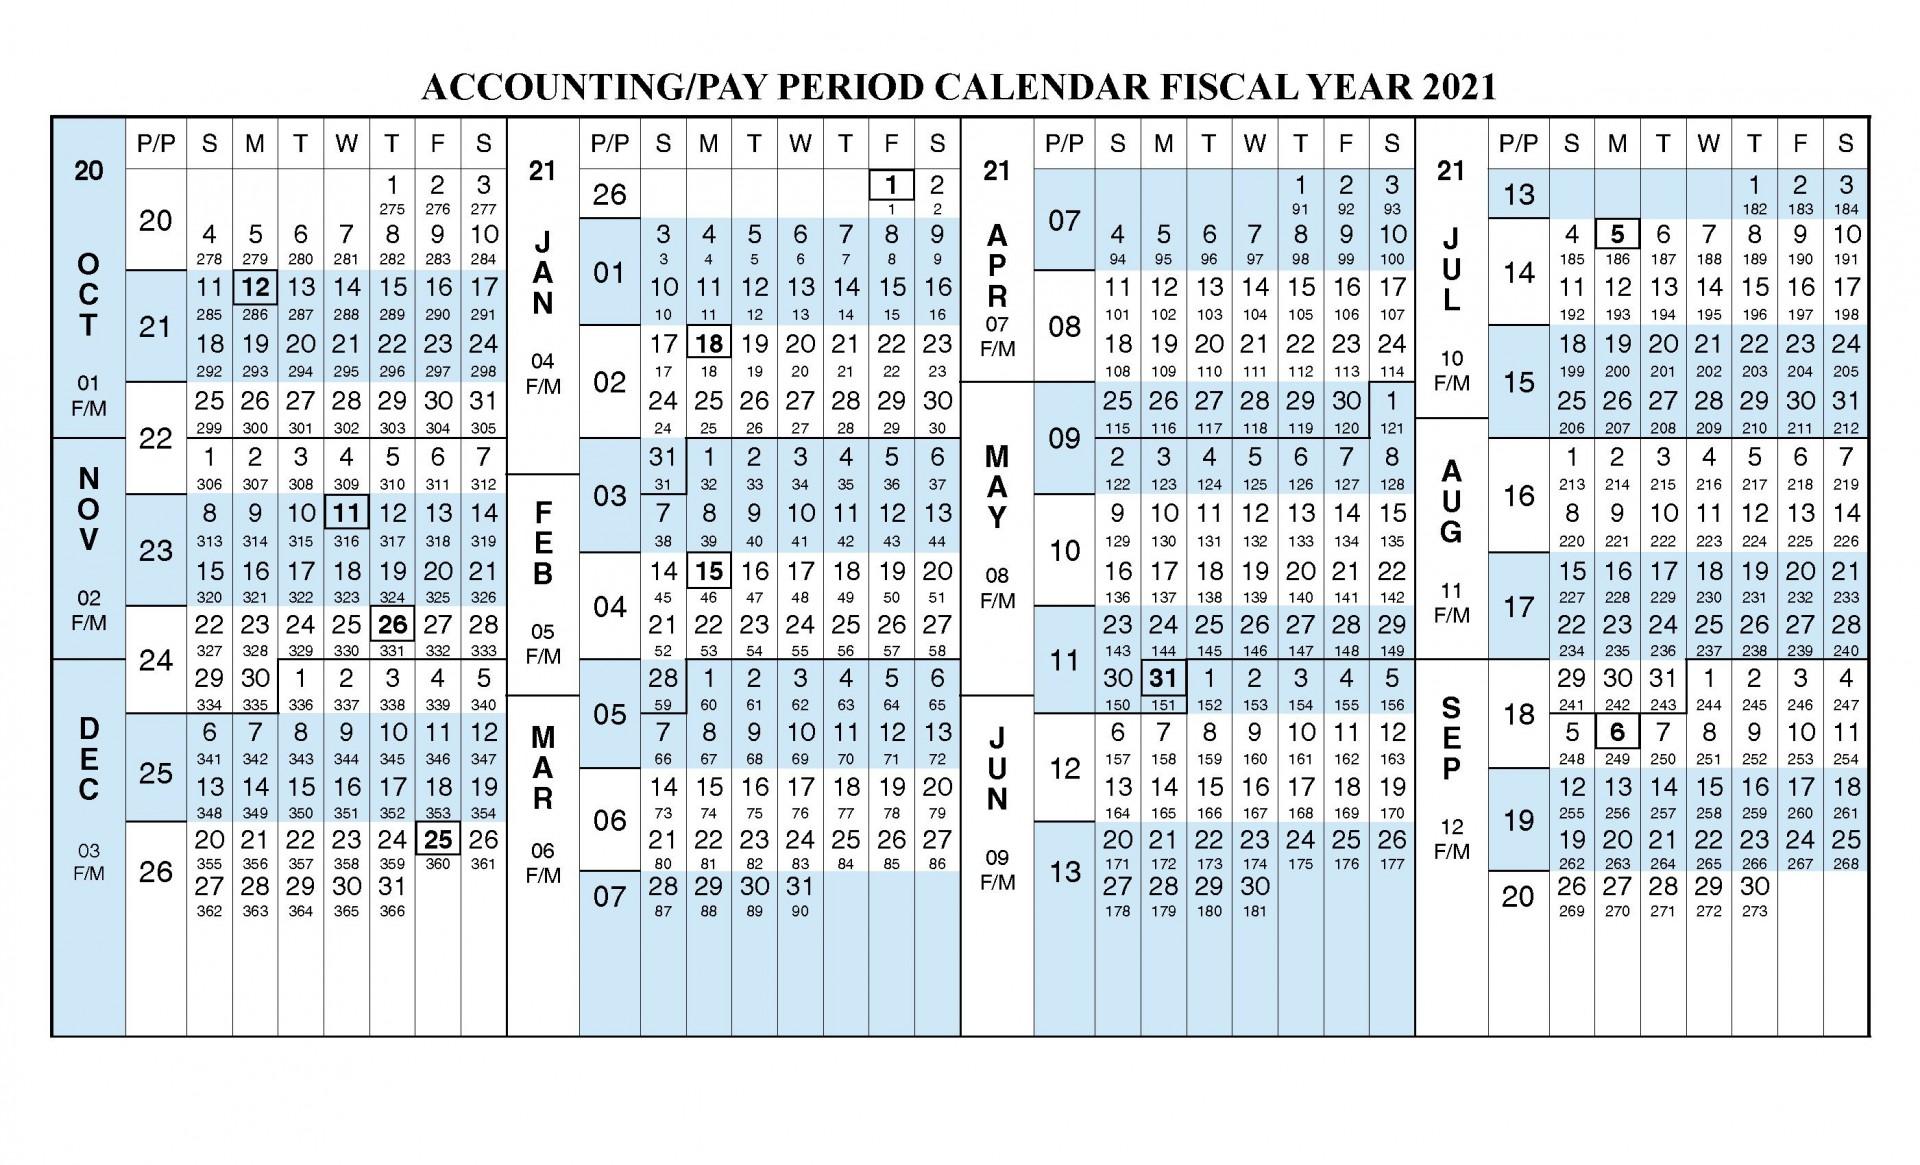 002 Top Payroll Calendar Template 2020 Example  Biweekly Schedule Excel Free1920